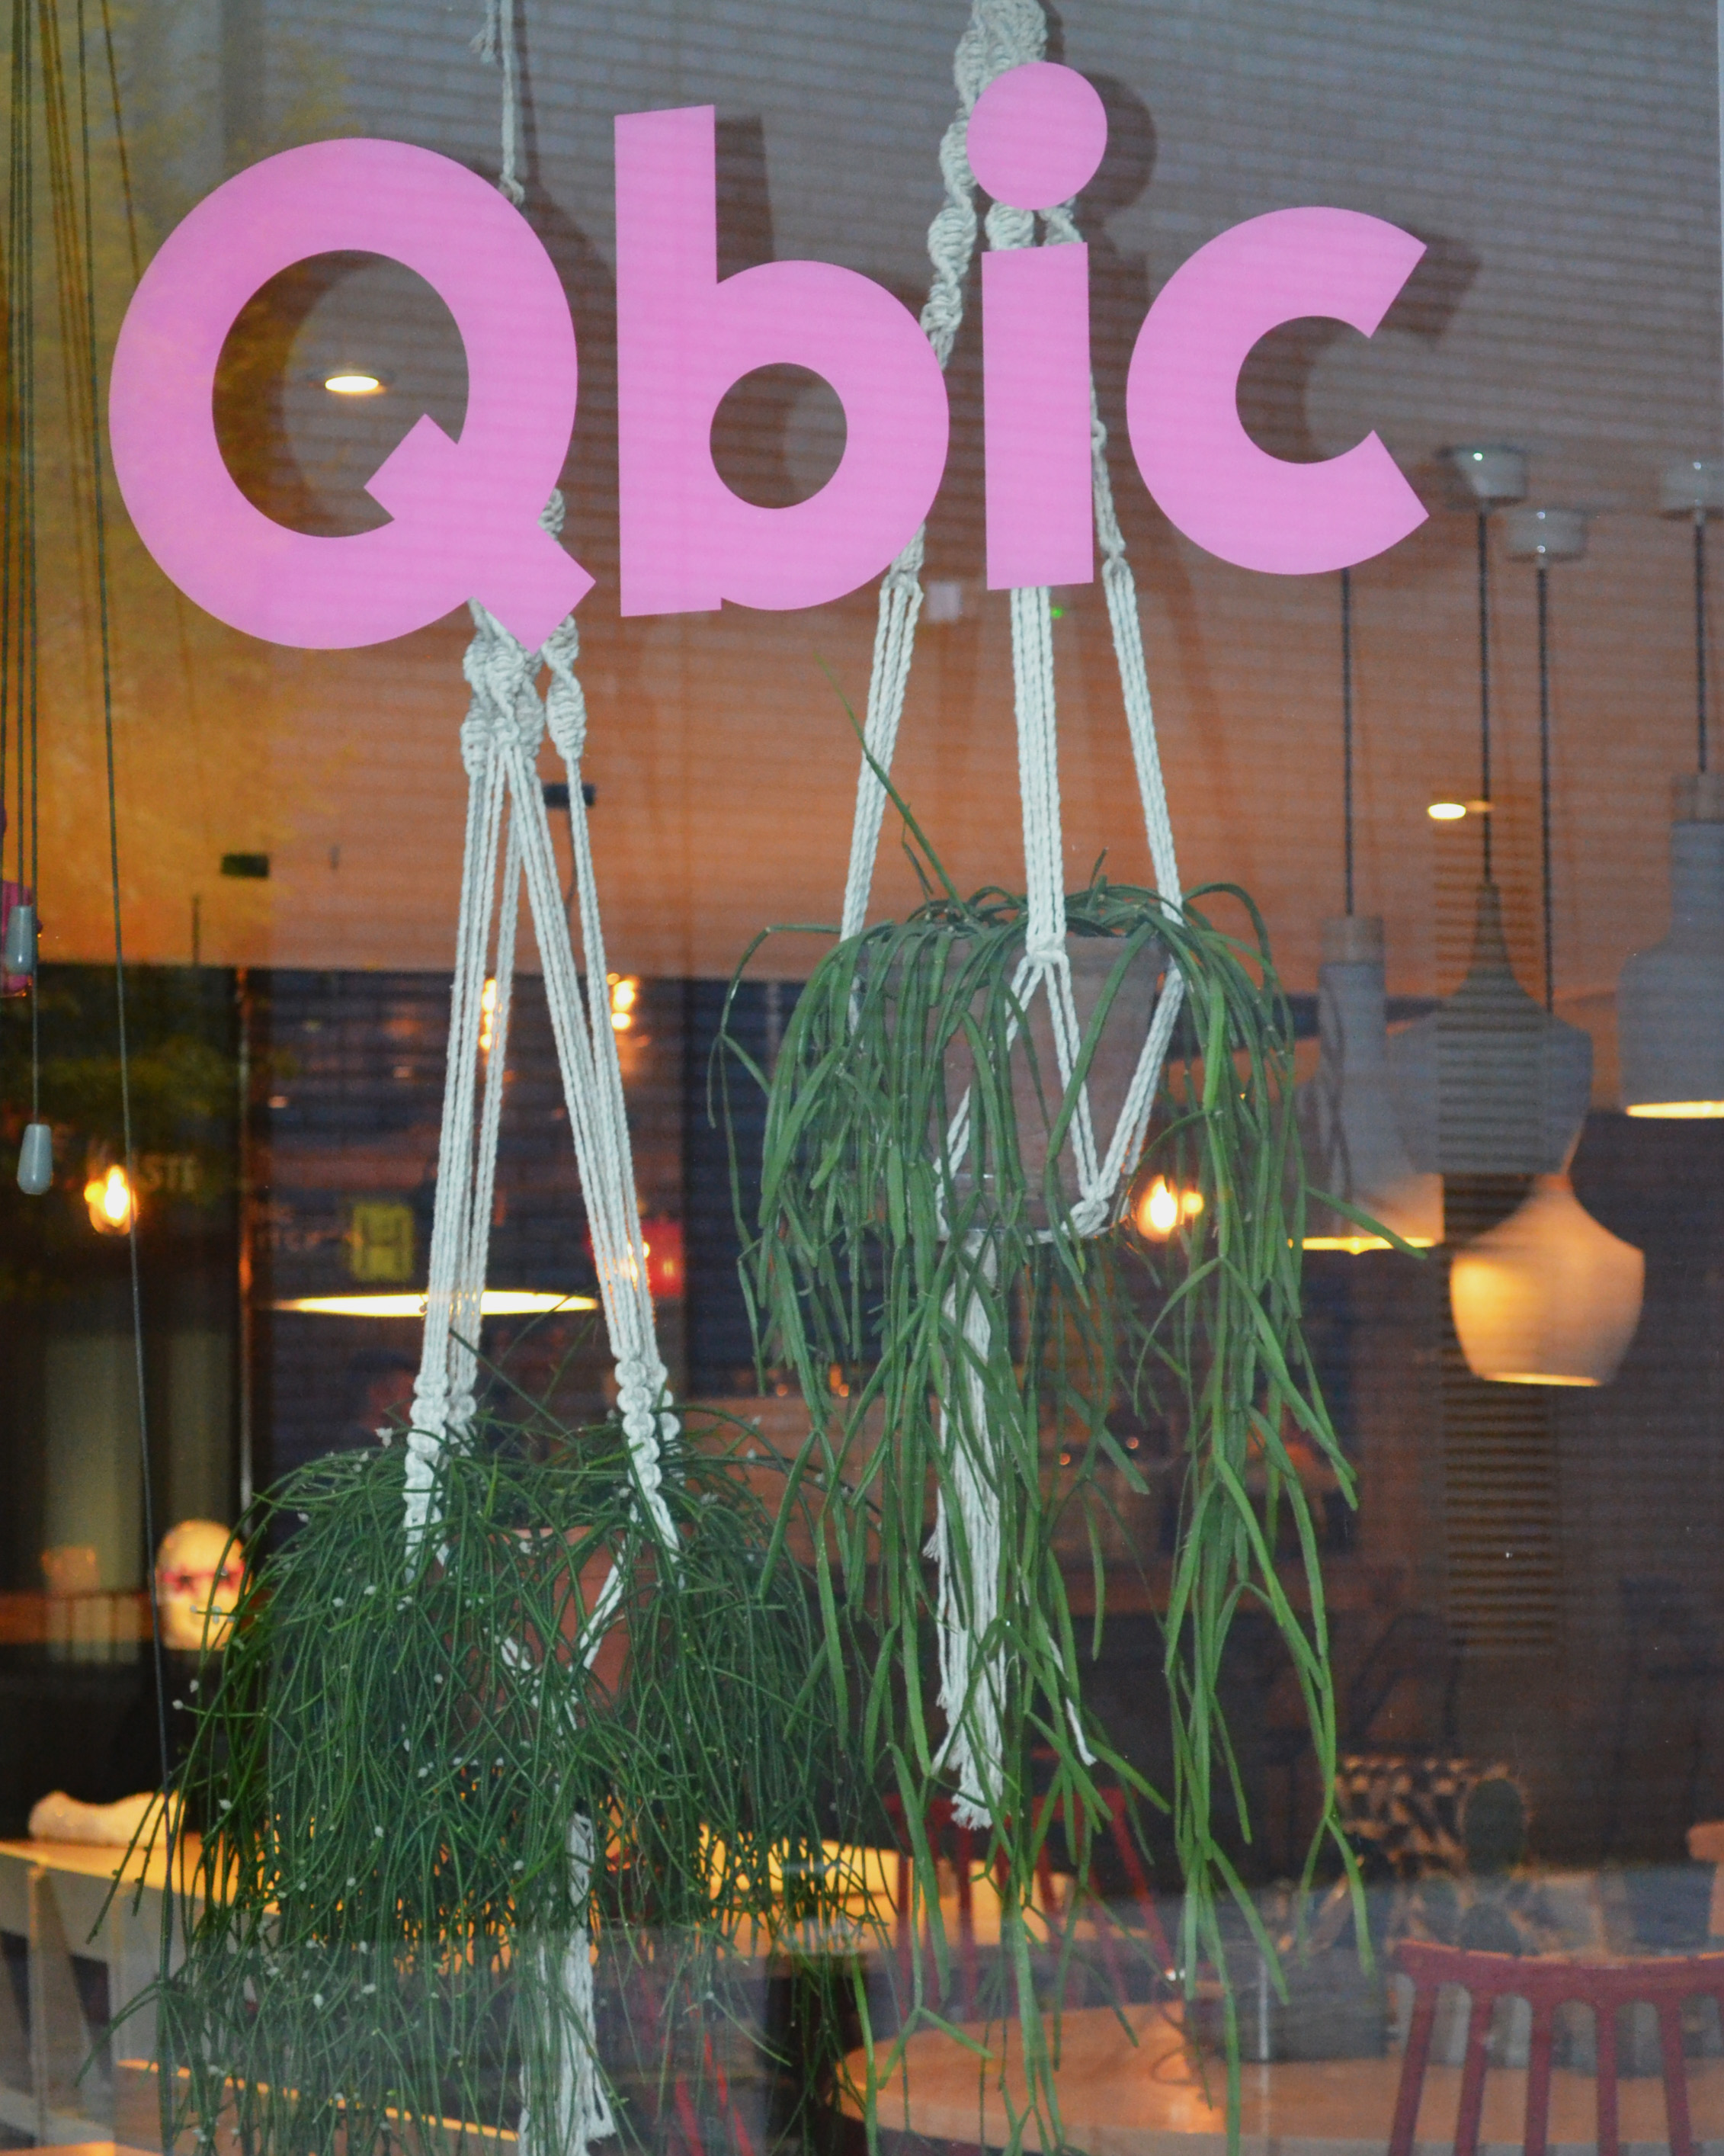 qbic-hotel.JPG